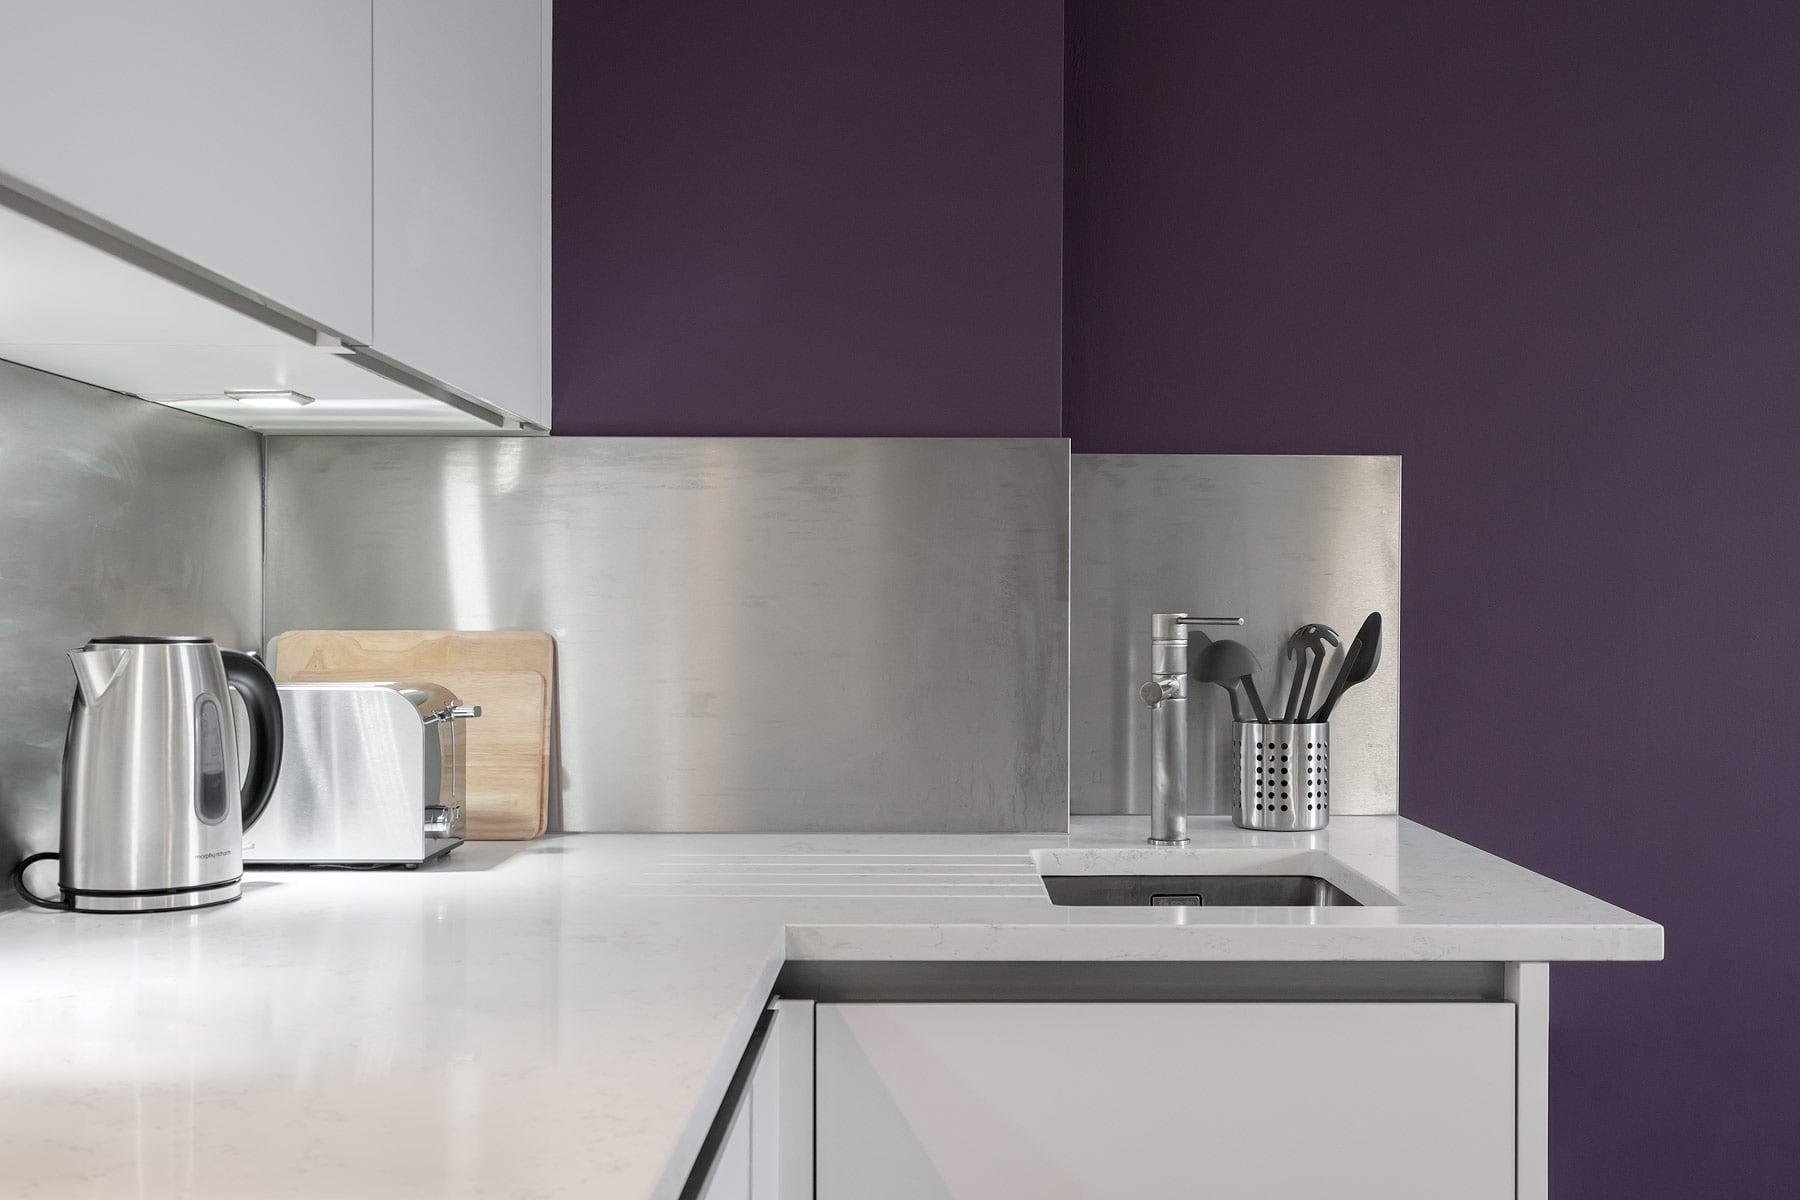 Kitchen_1P_Vin_Reading-WEB.jpg